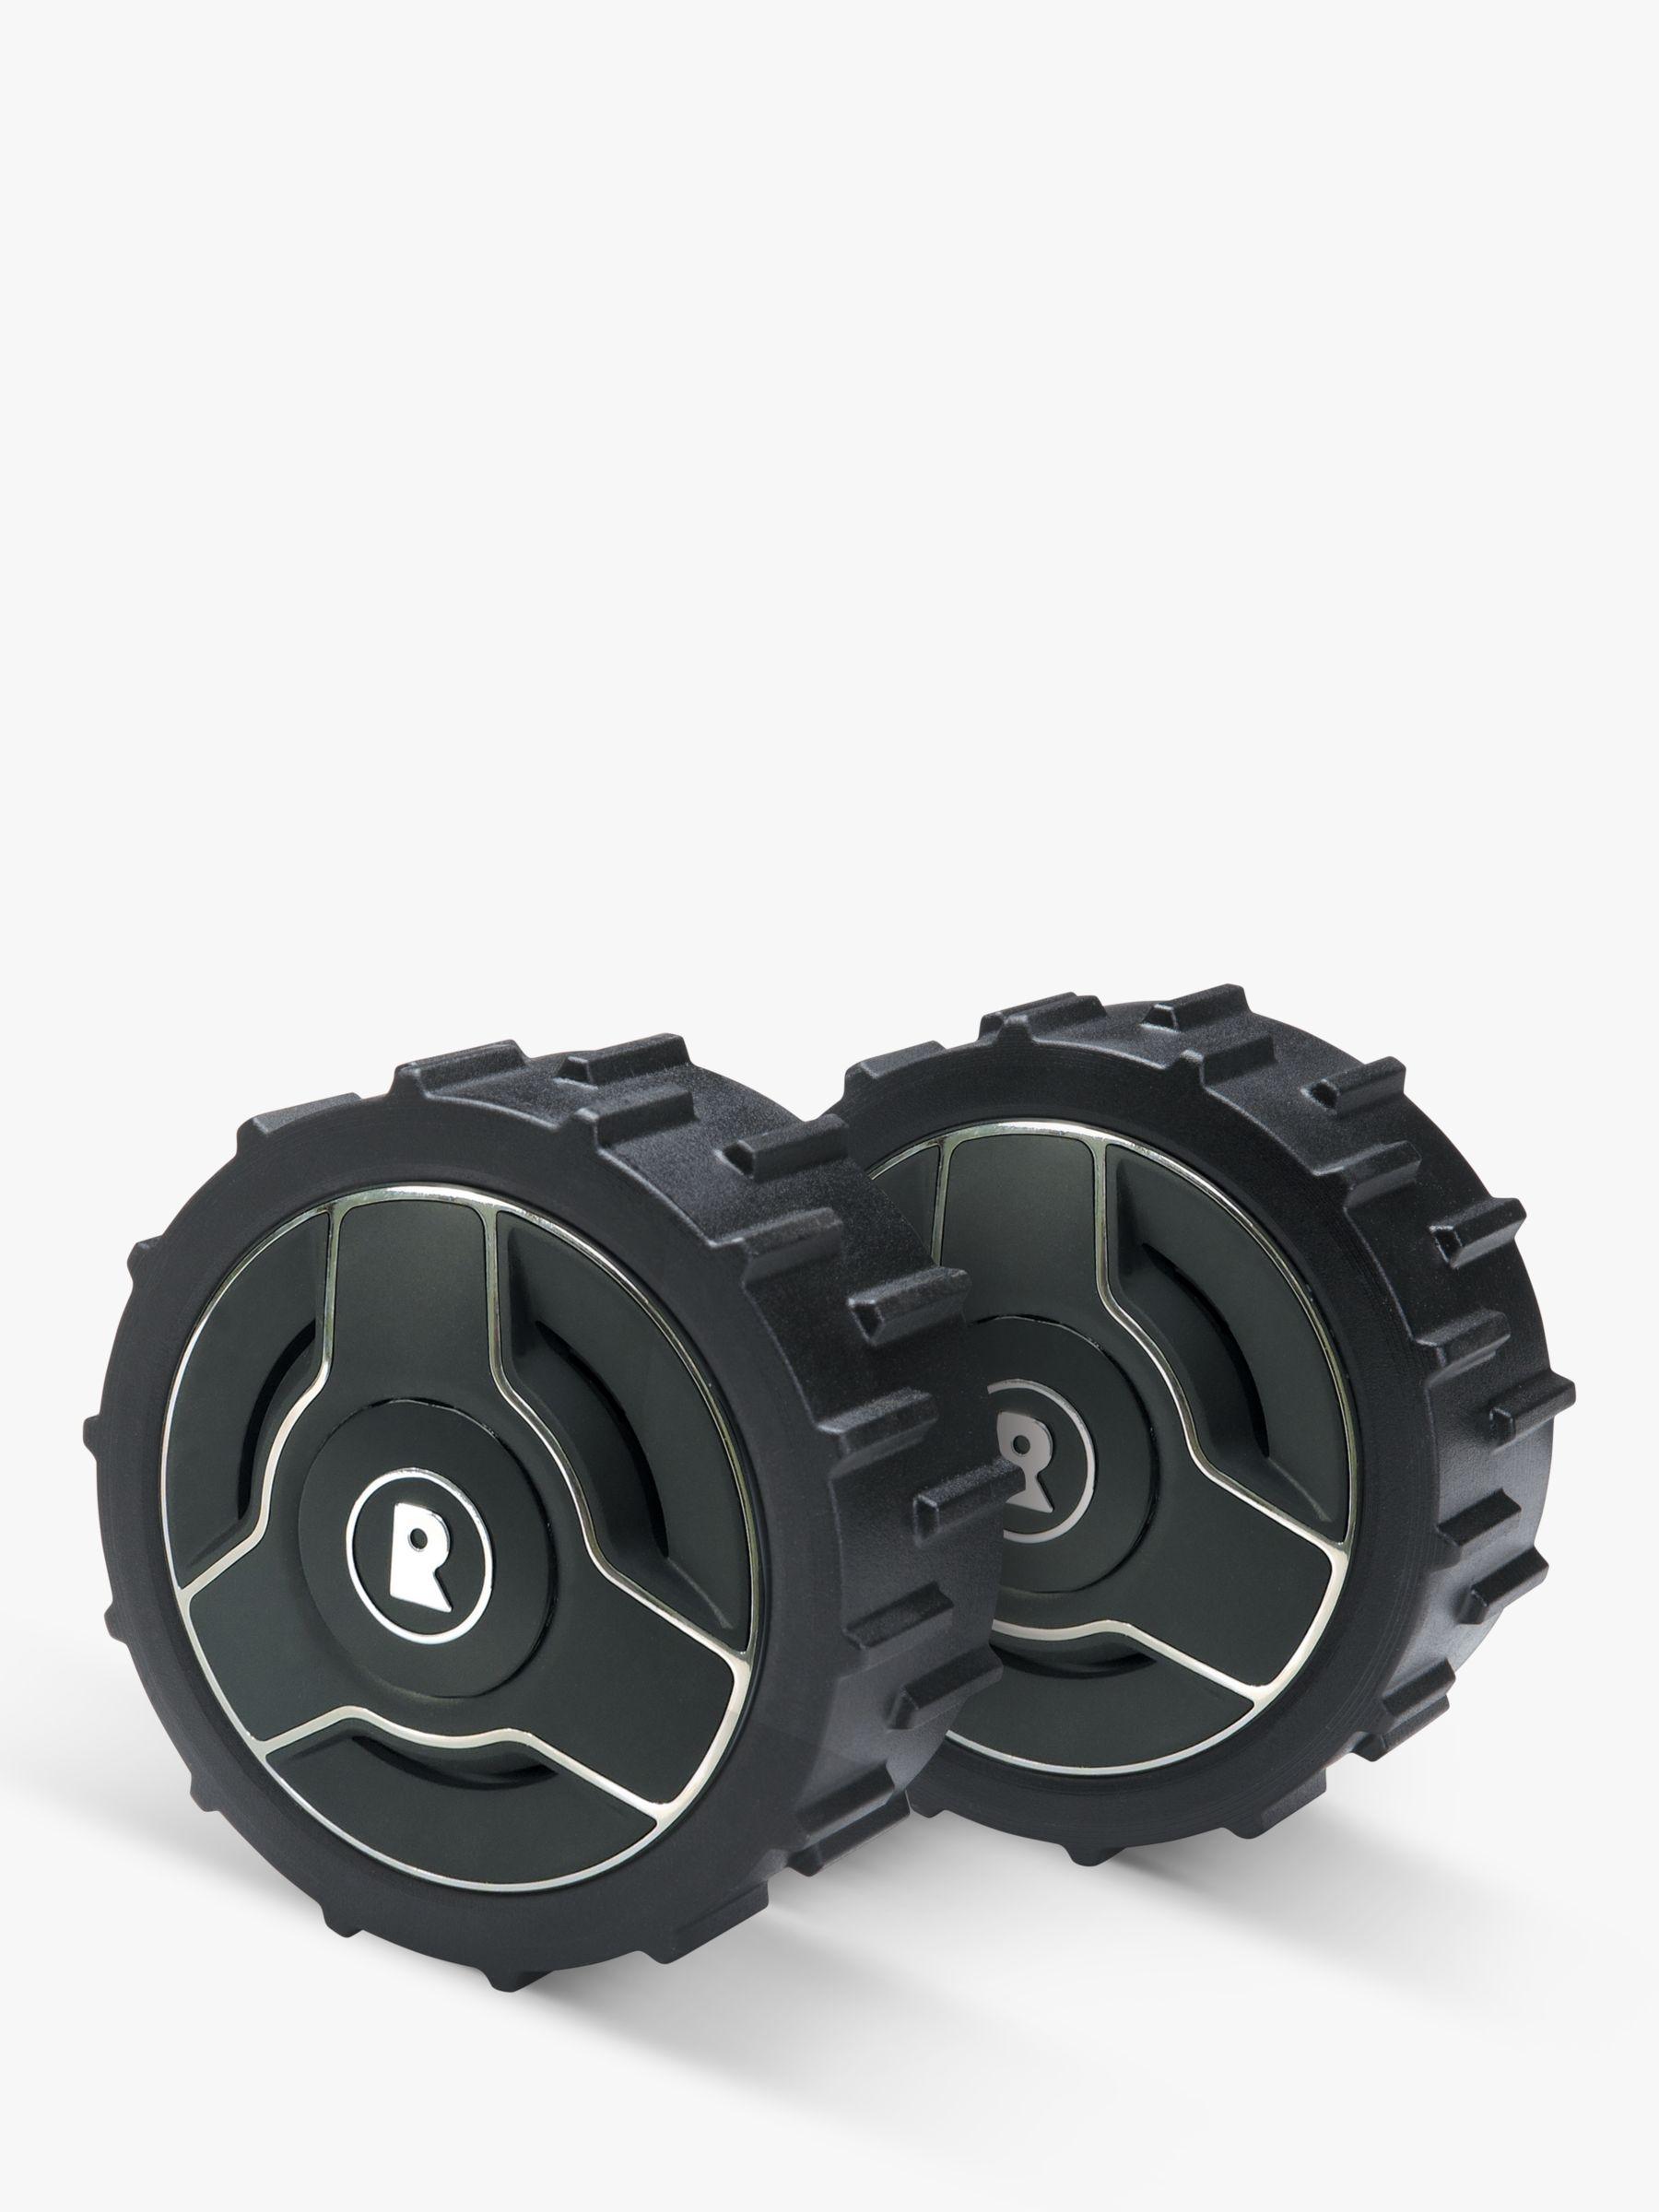 Robomow Robomow MRK6107A Power Wheels for RS Models